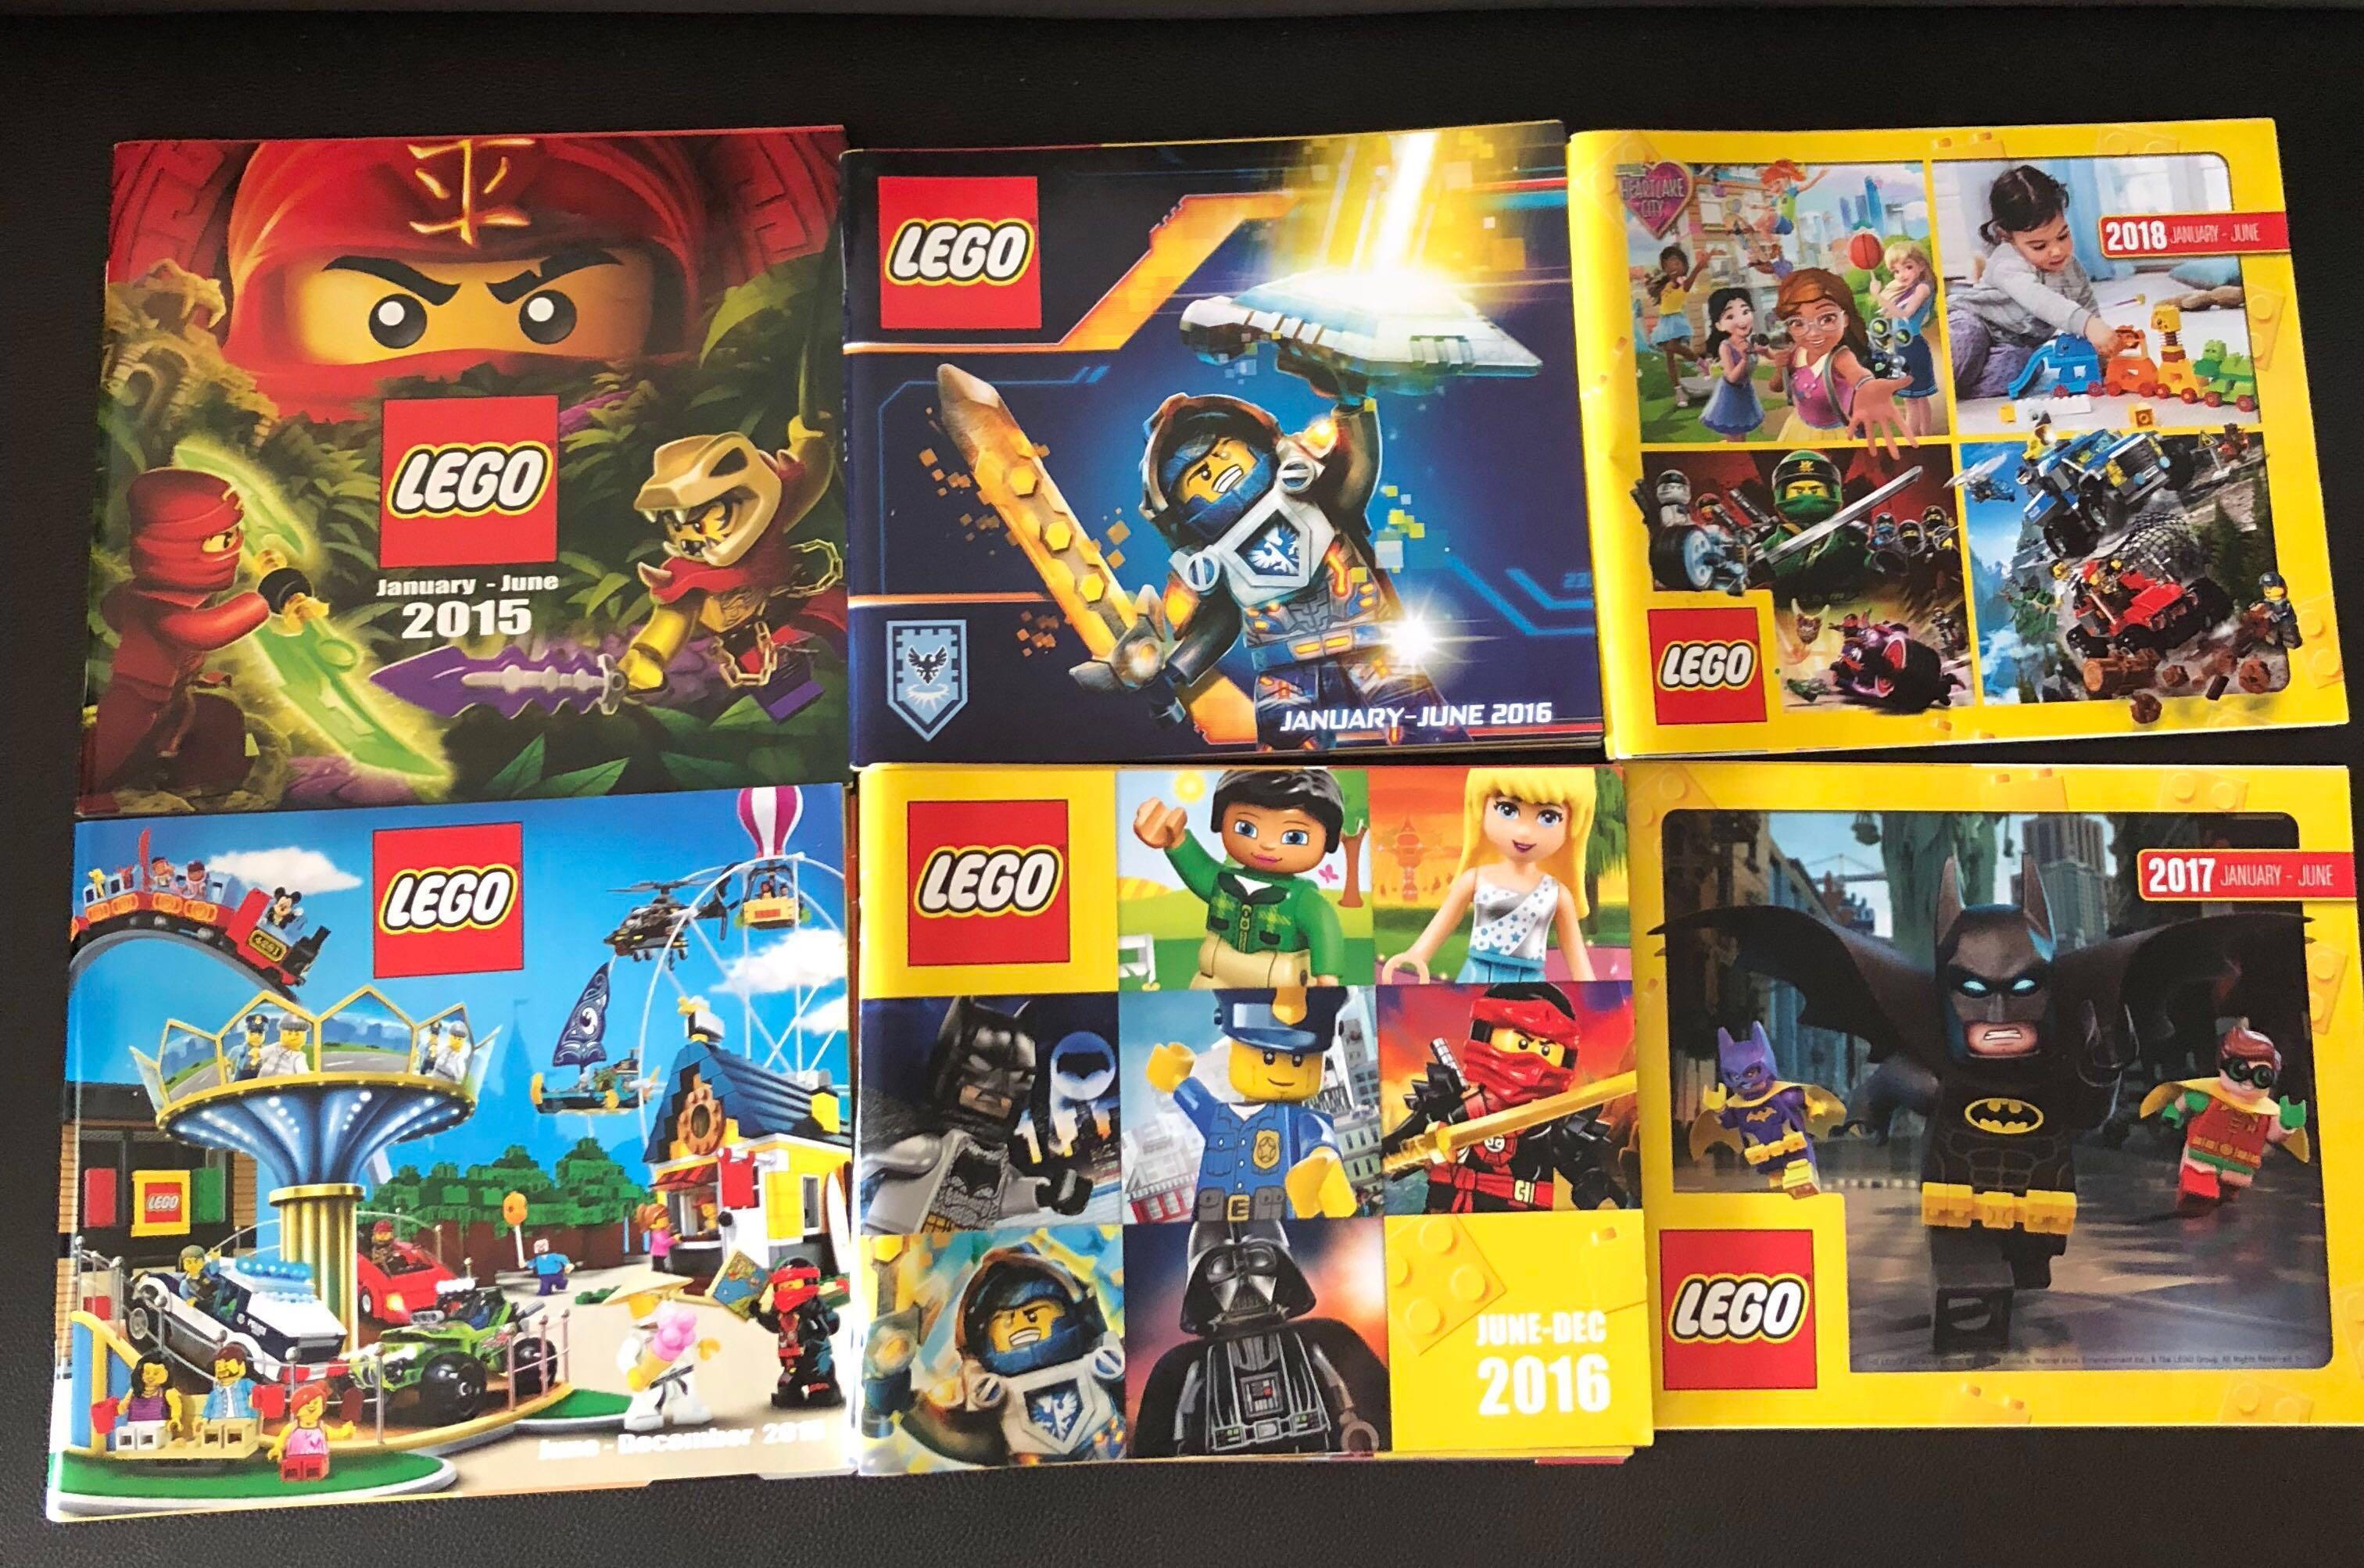 Lego Catalogue, Toys & Games, Bricks & Figurines on Carousell